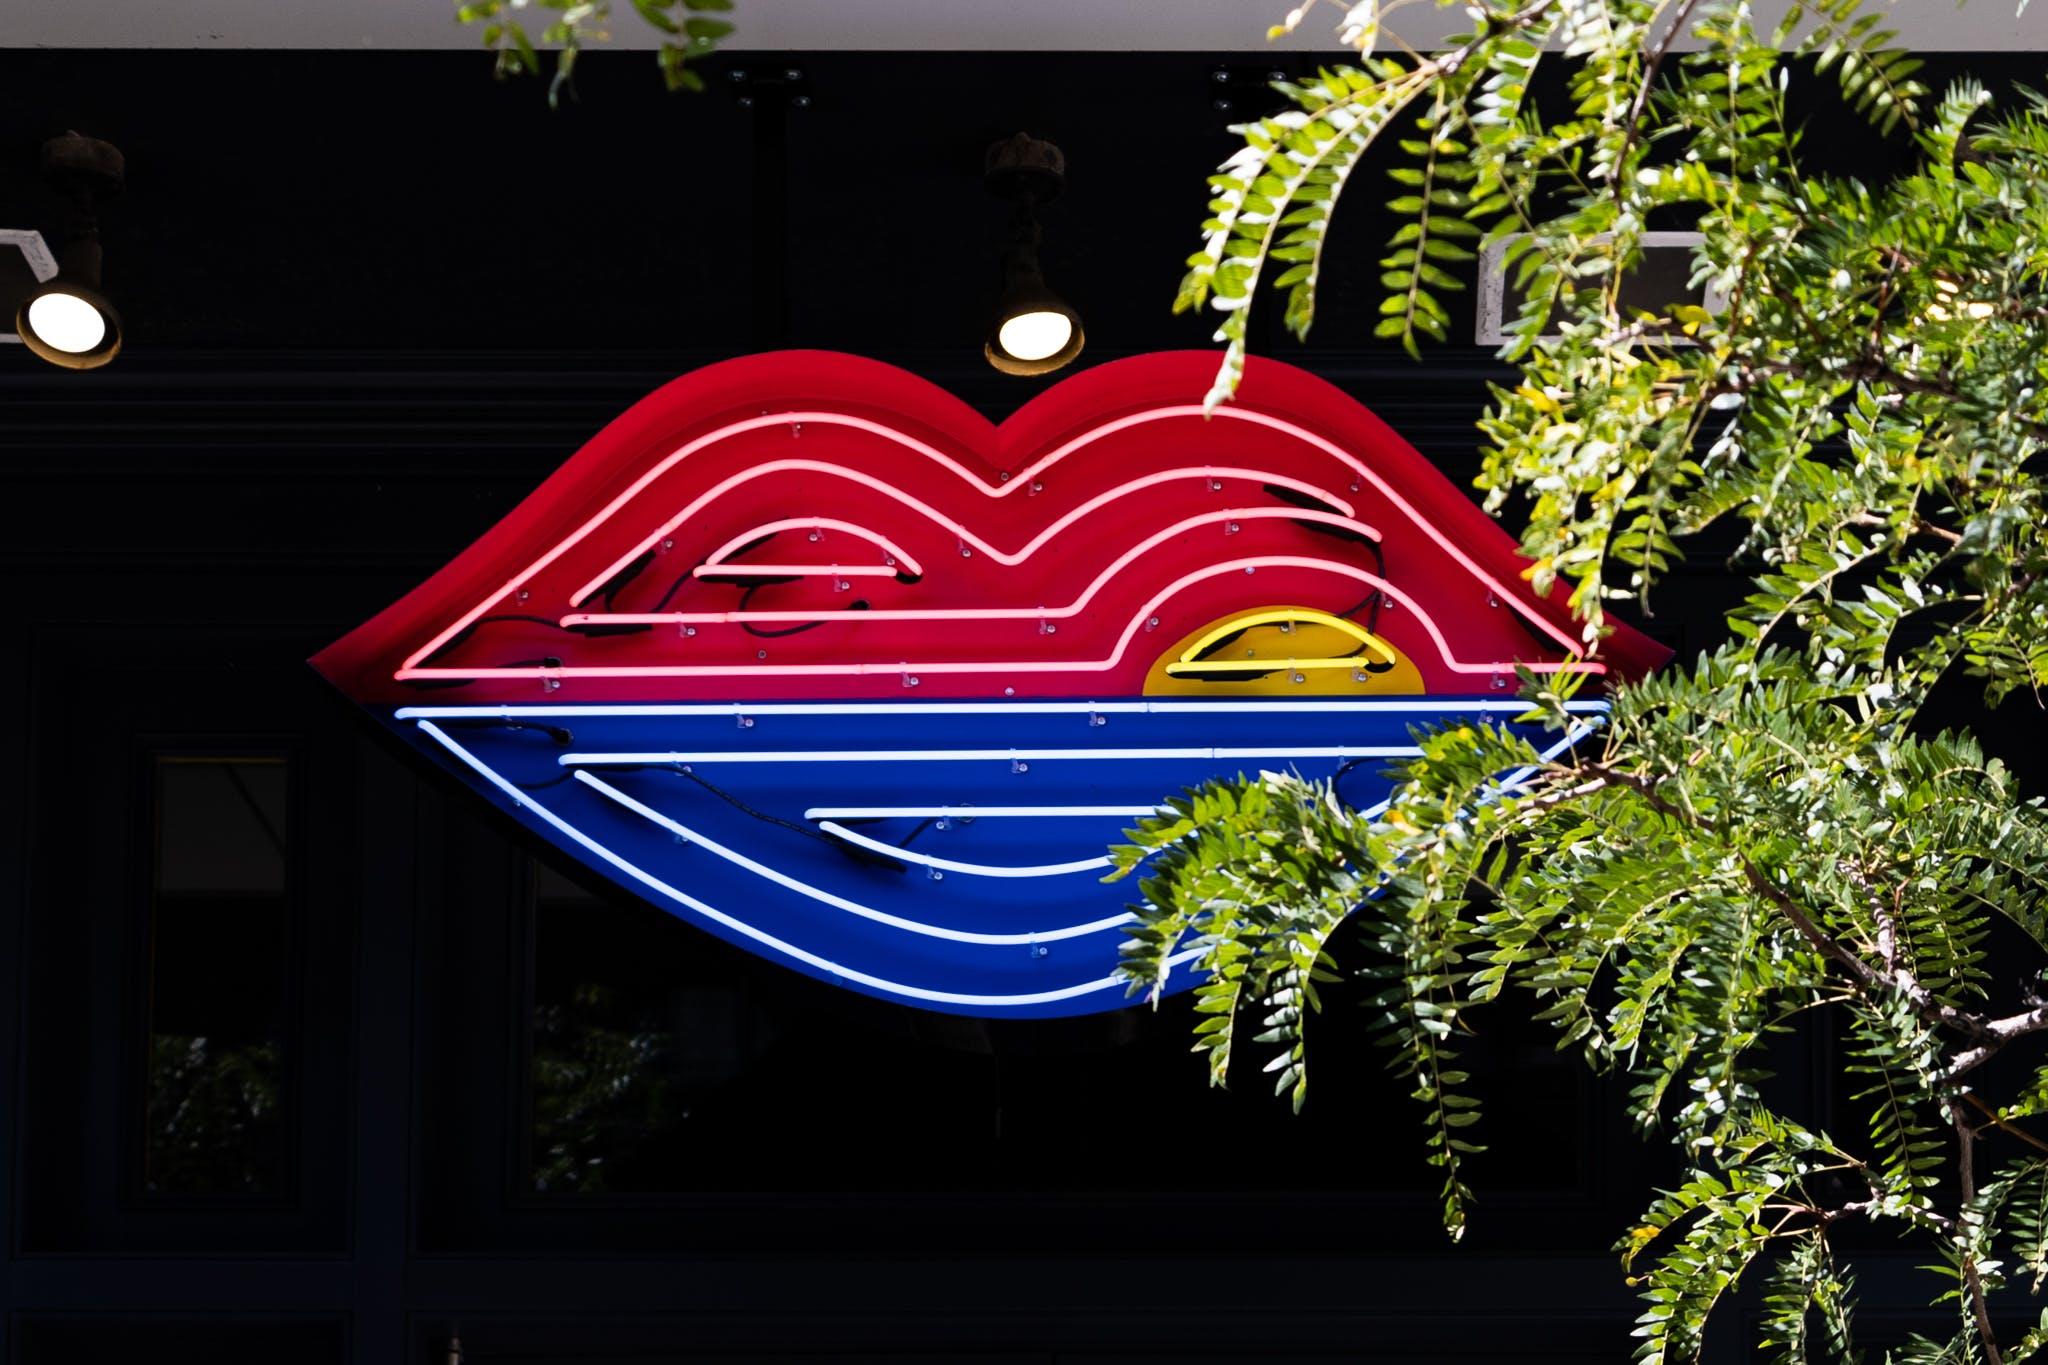 Pink Sky lips logo neon signage